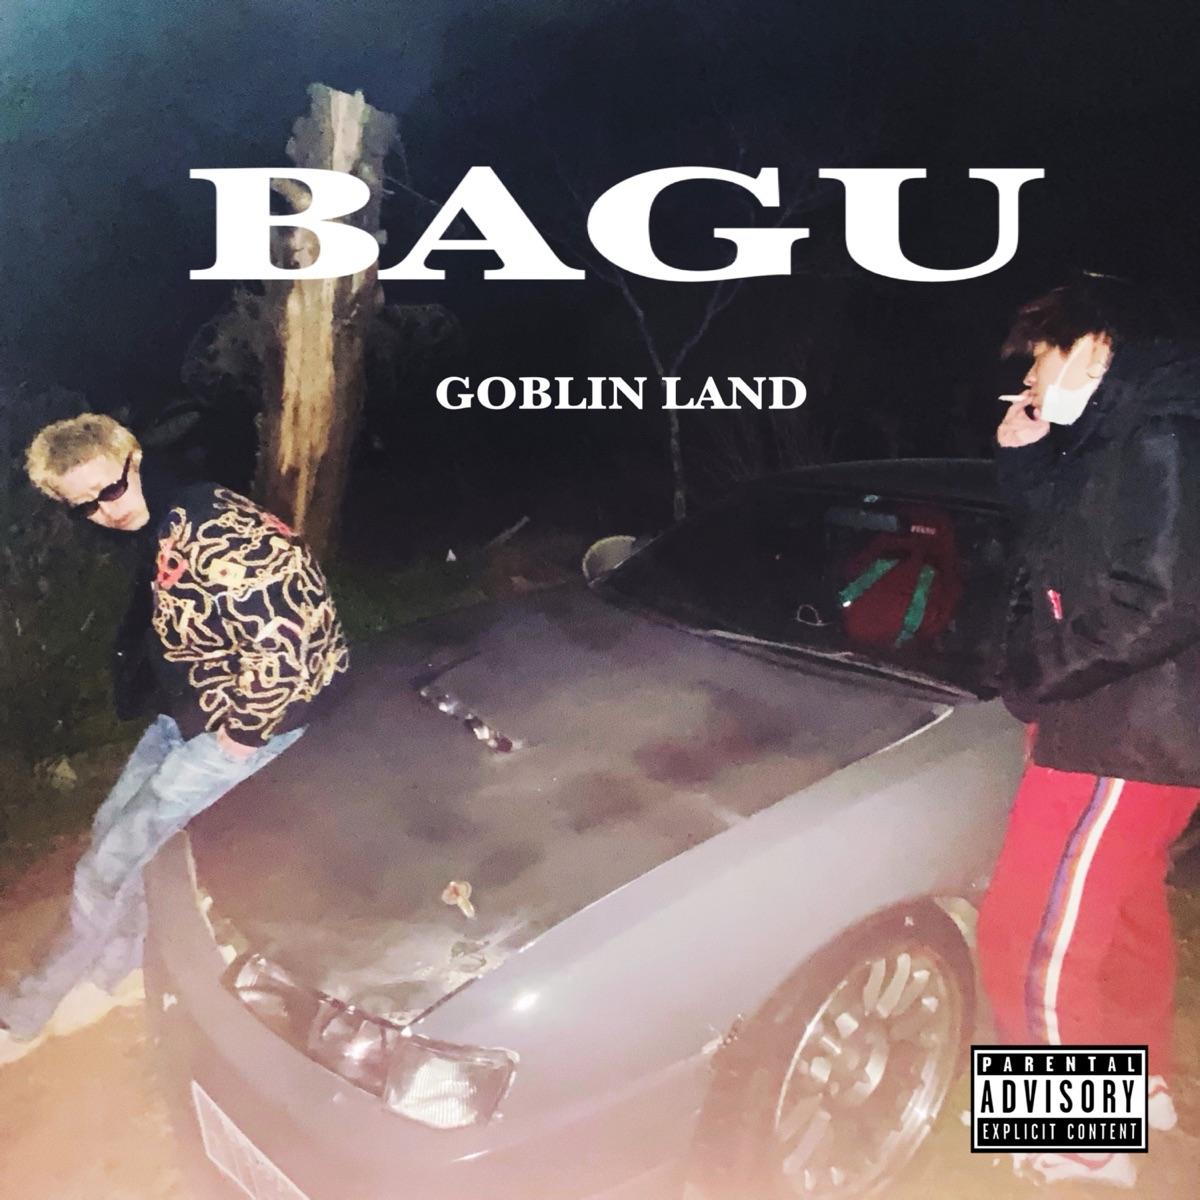 『GOBLIN LAND - BAGU』収録の『BAGU』ジャケット